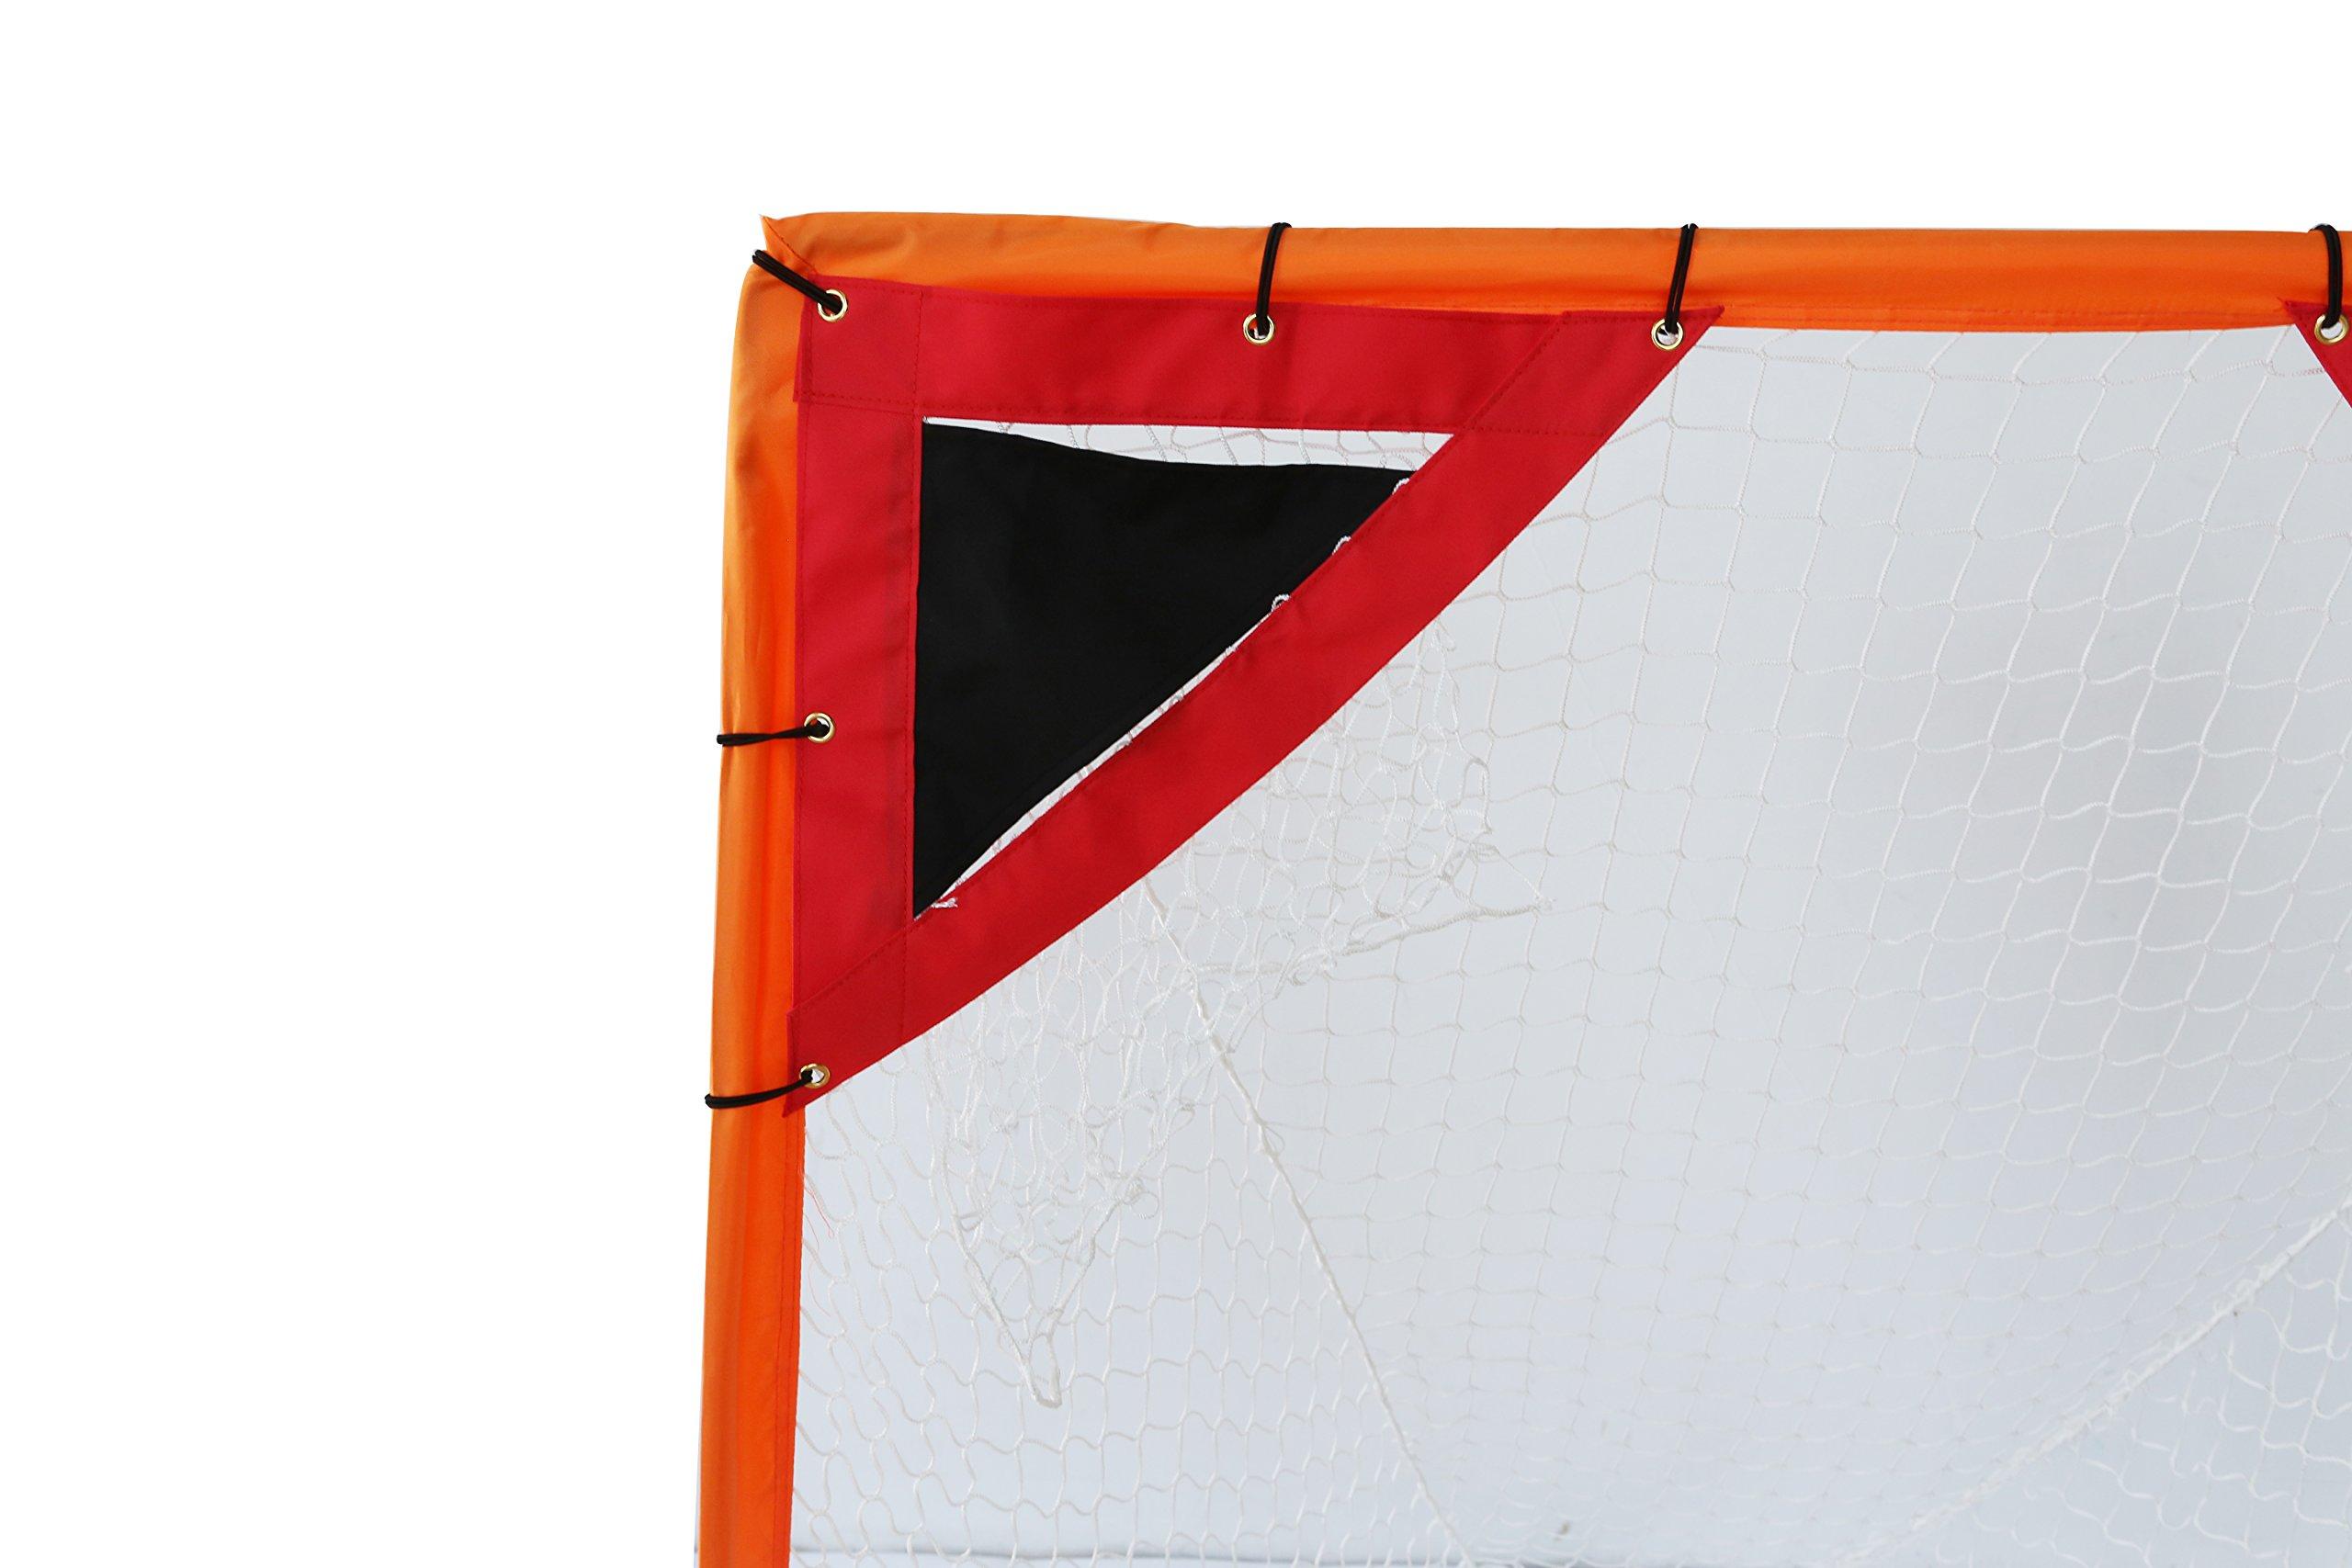 18'' Lacrosse Net Goal Shooting Corner Targets - Set of 2 by Trademark Innovations by Trademark Innovations (Image #2)